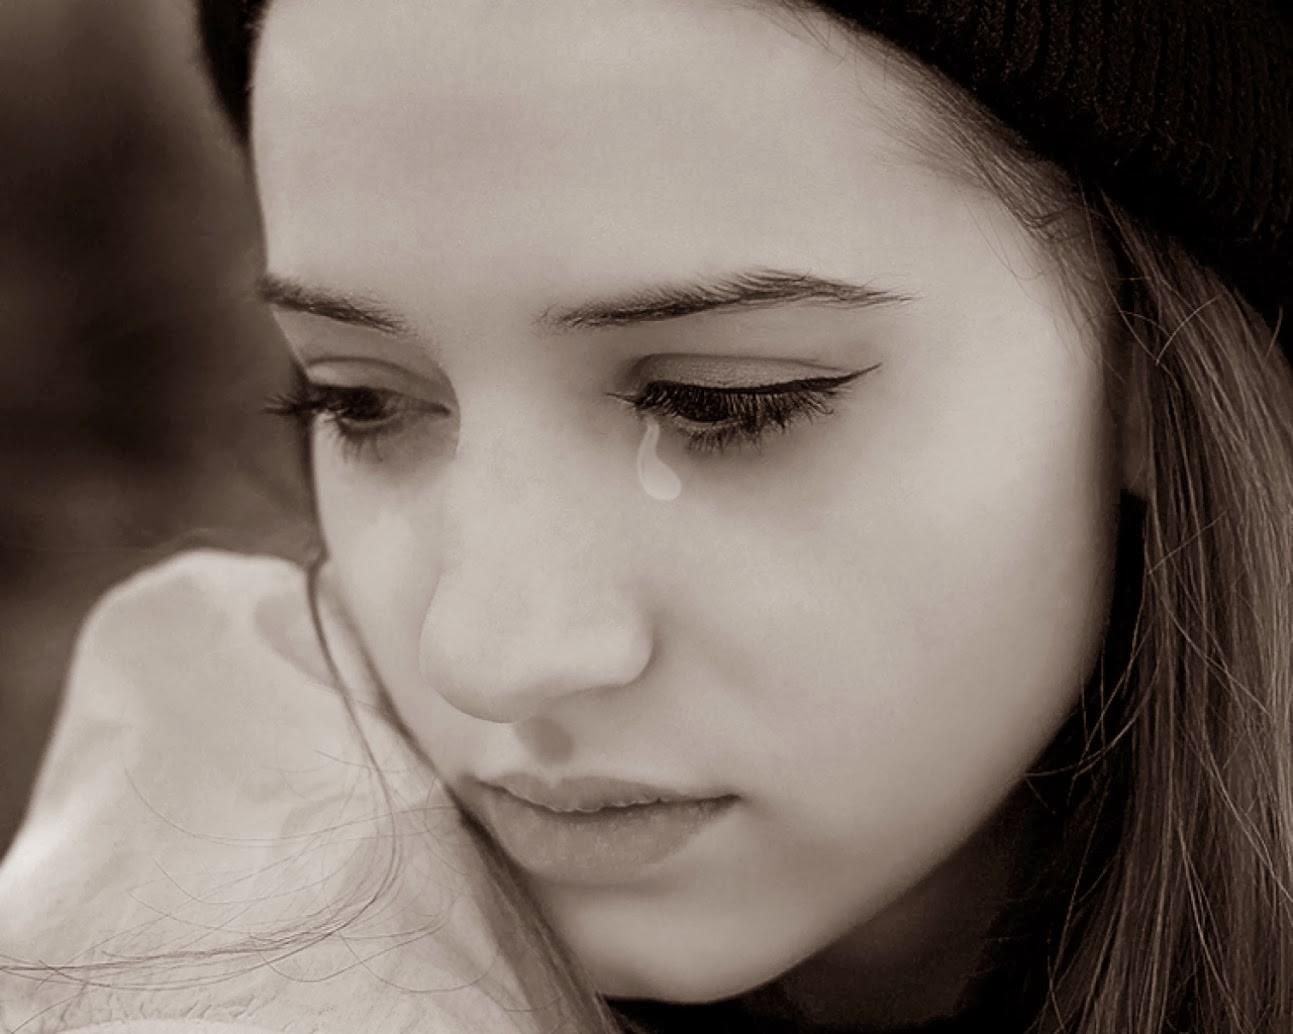 صور صور بنت حزينه , صور بنات تبكي